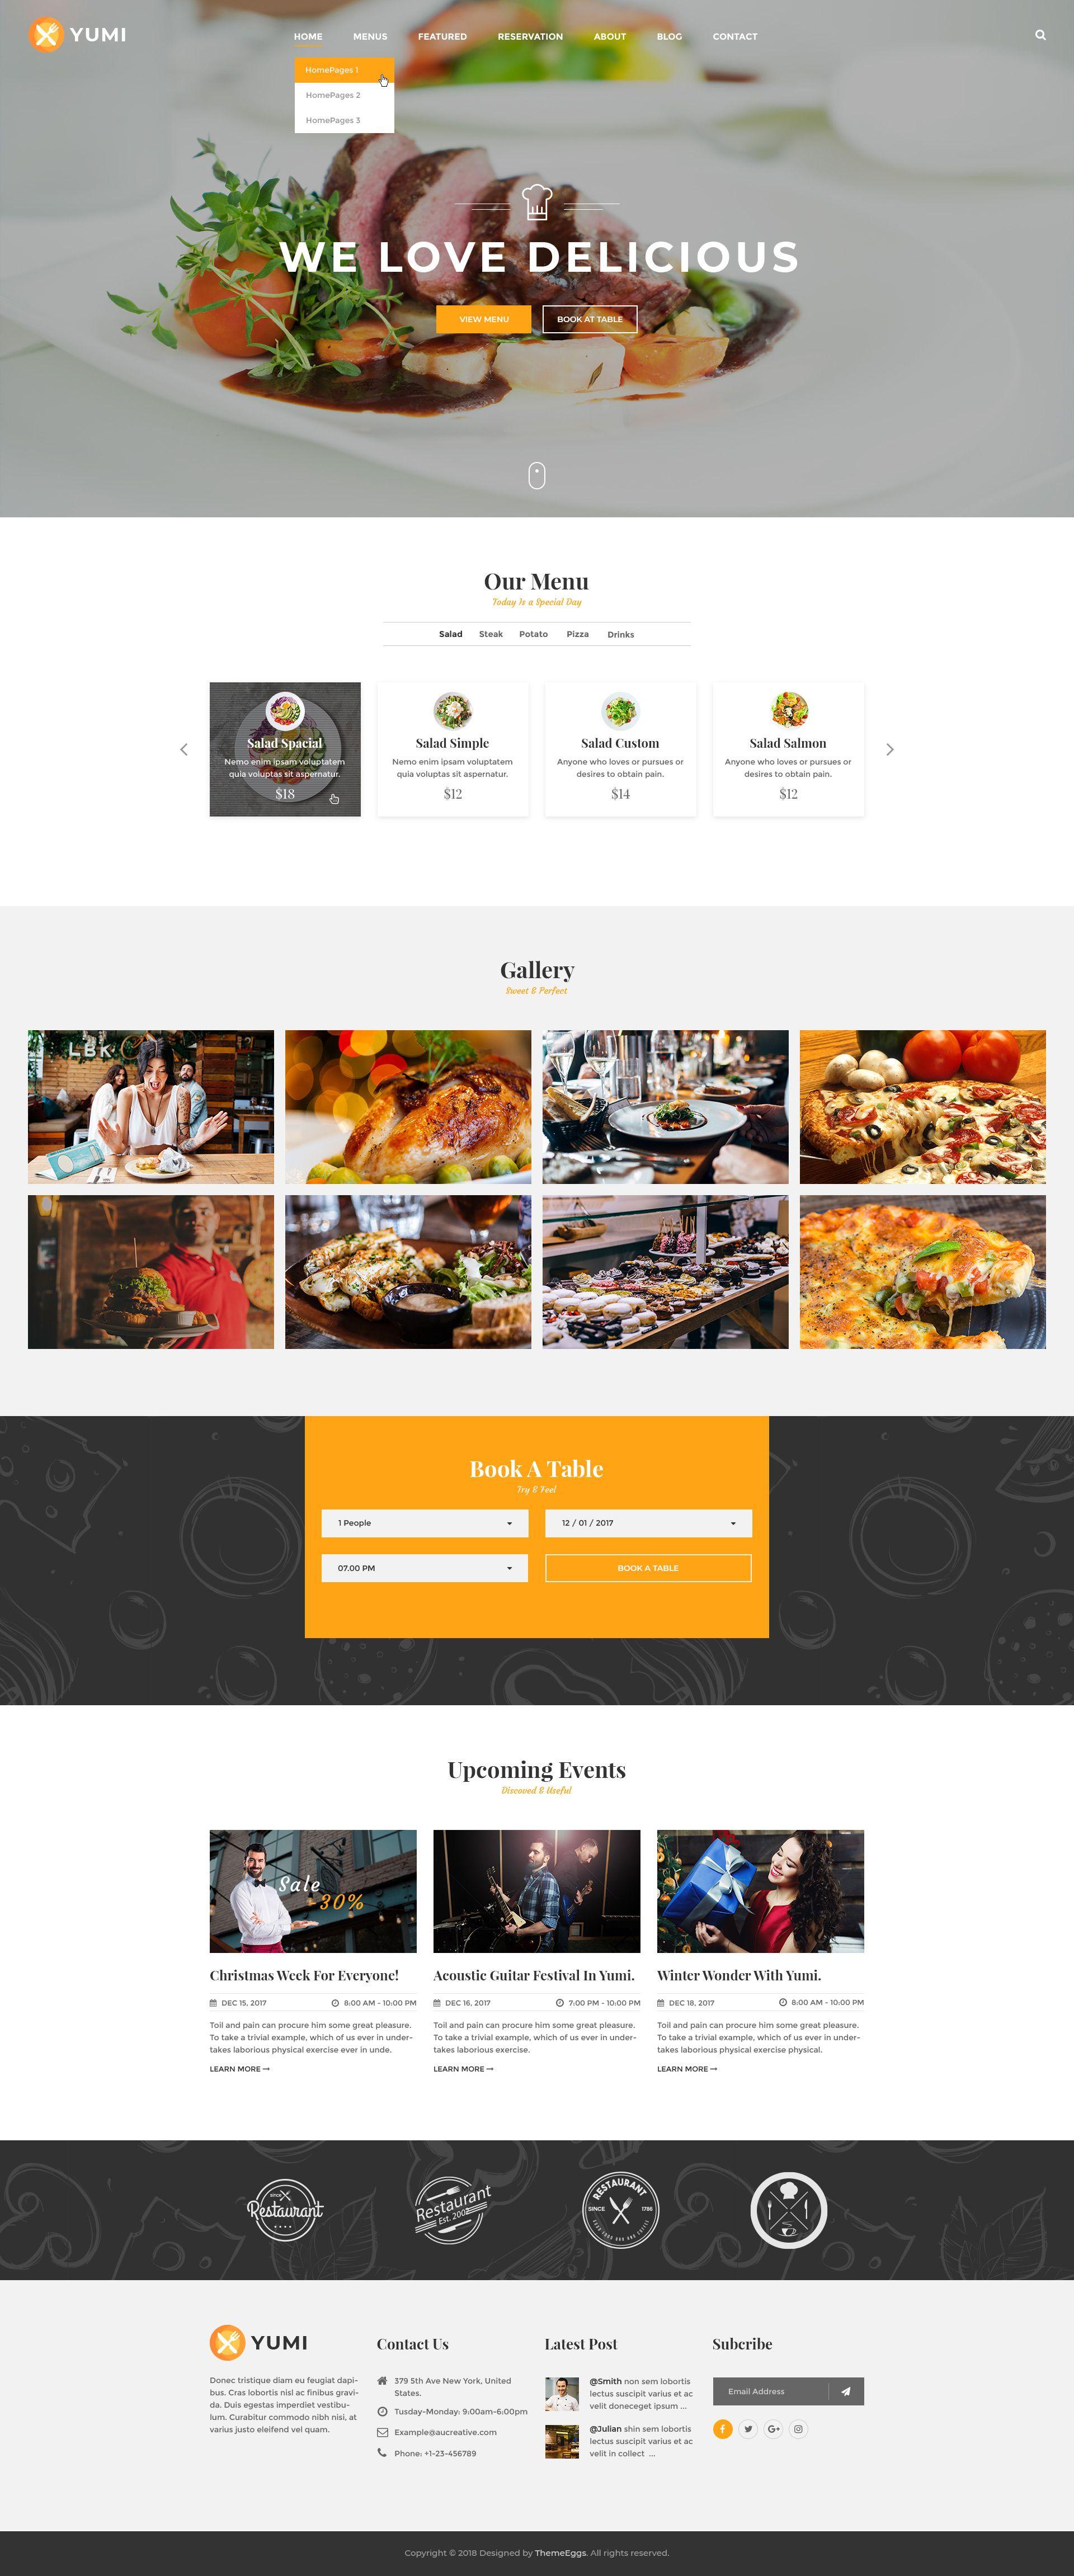 Yumi Restaurant Psd Template Restaurant Website Design Food Web Design Restaurant Web